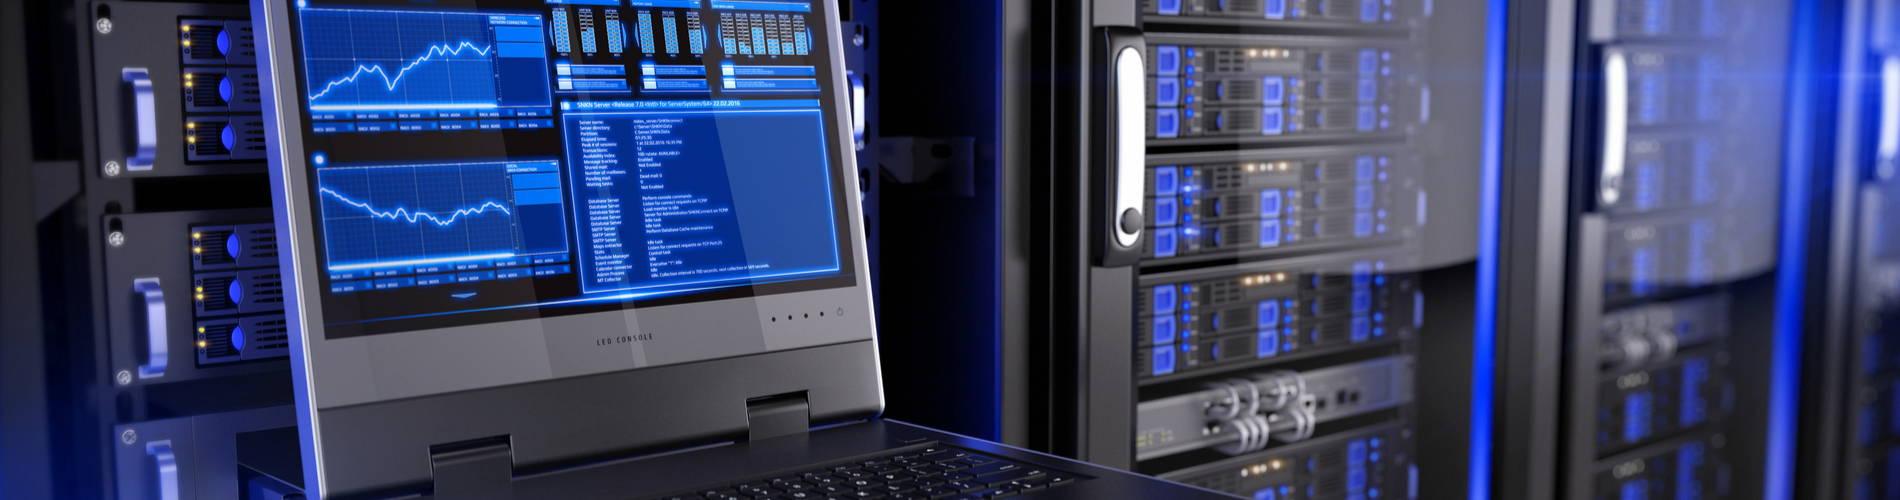 HPC Cluster Computing